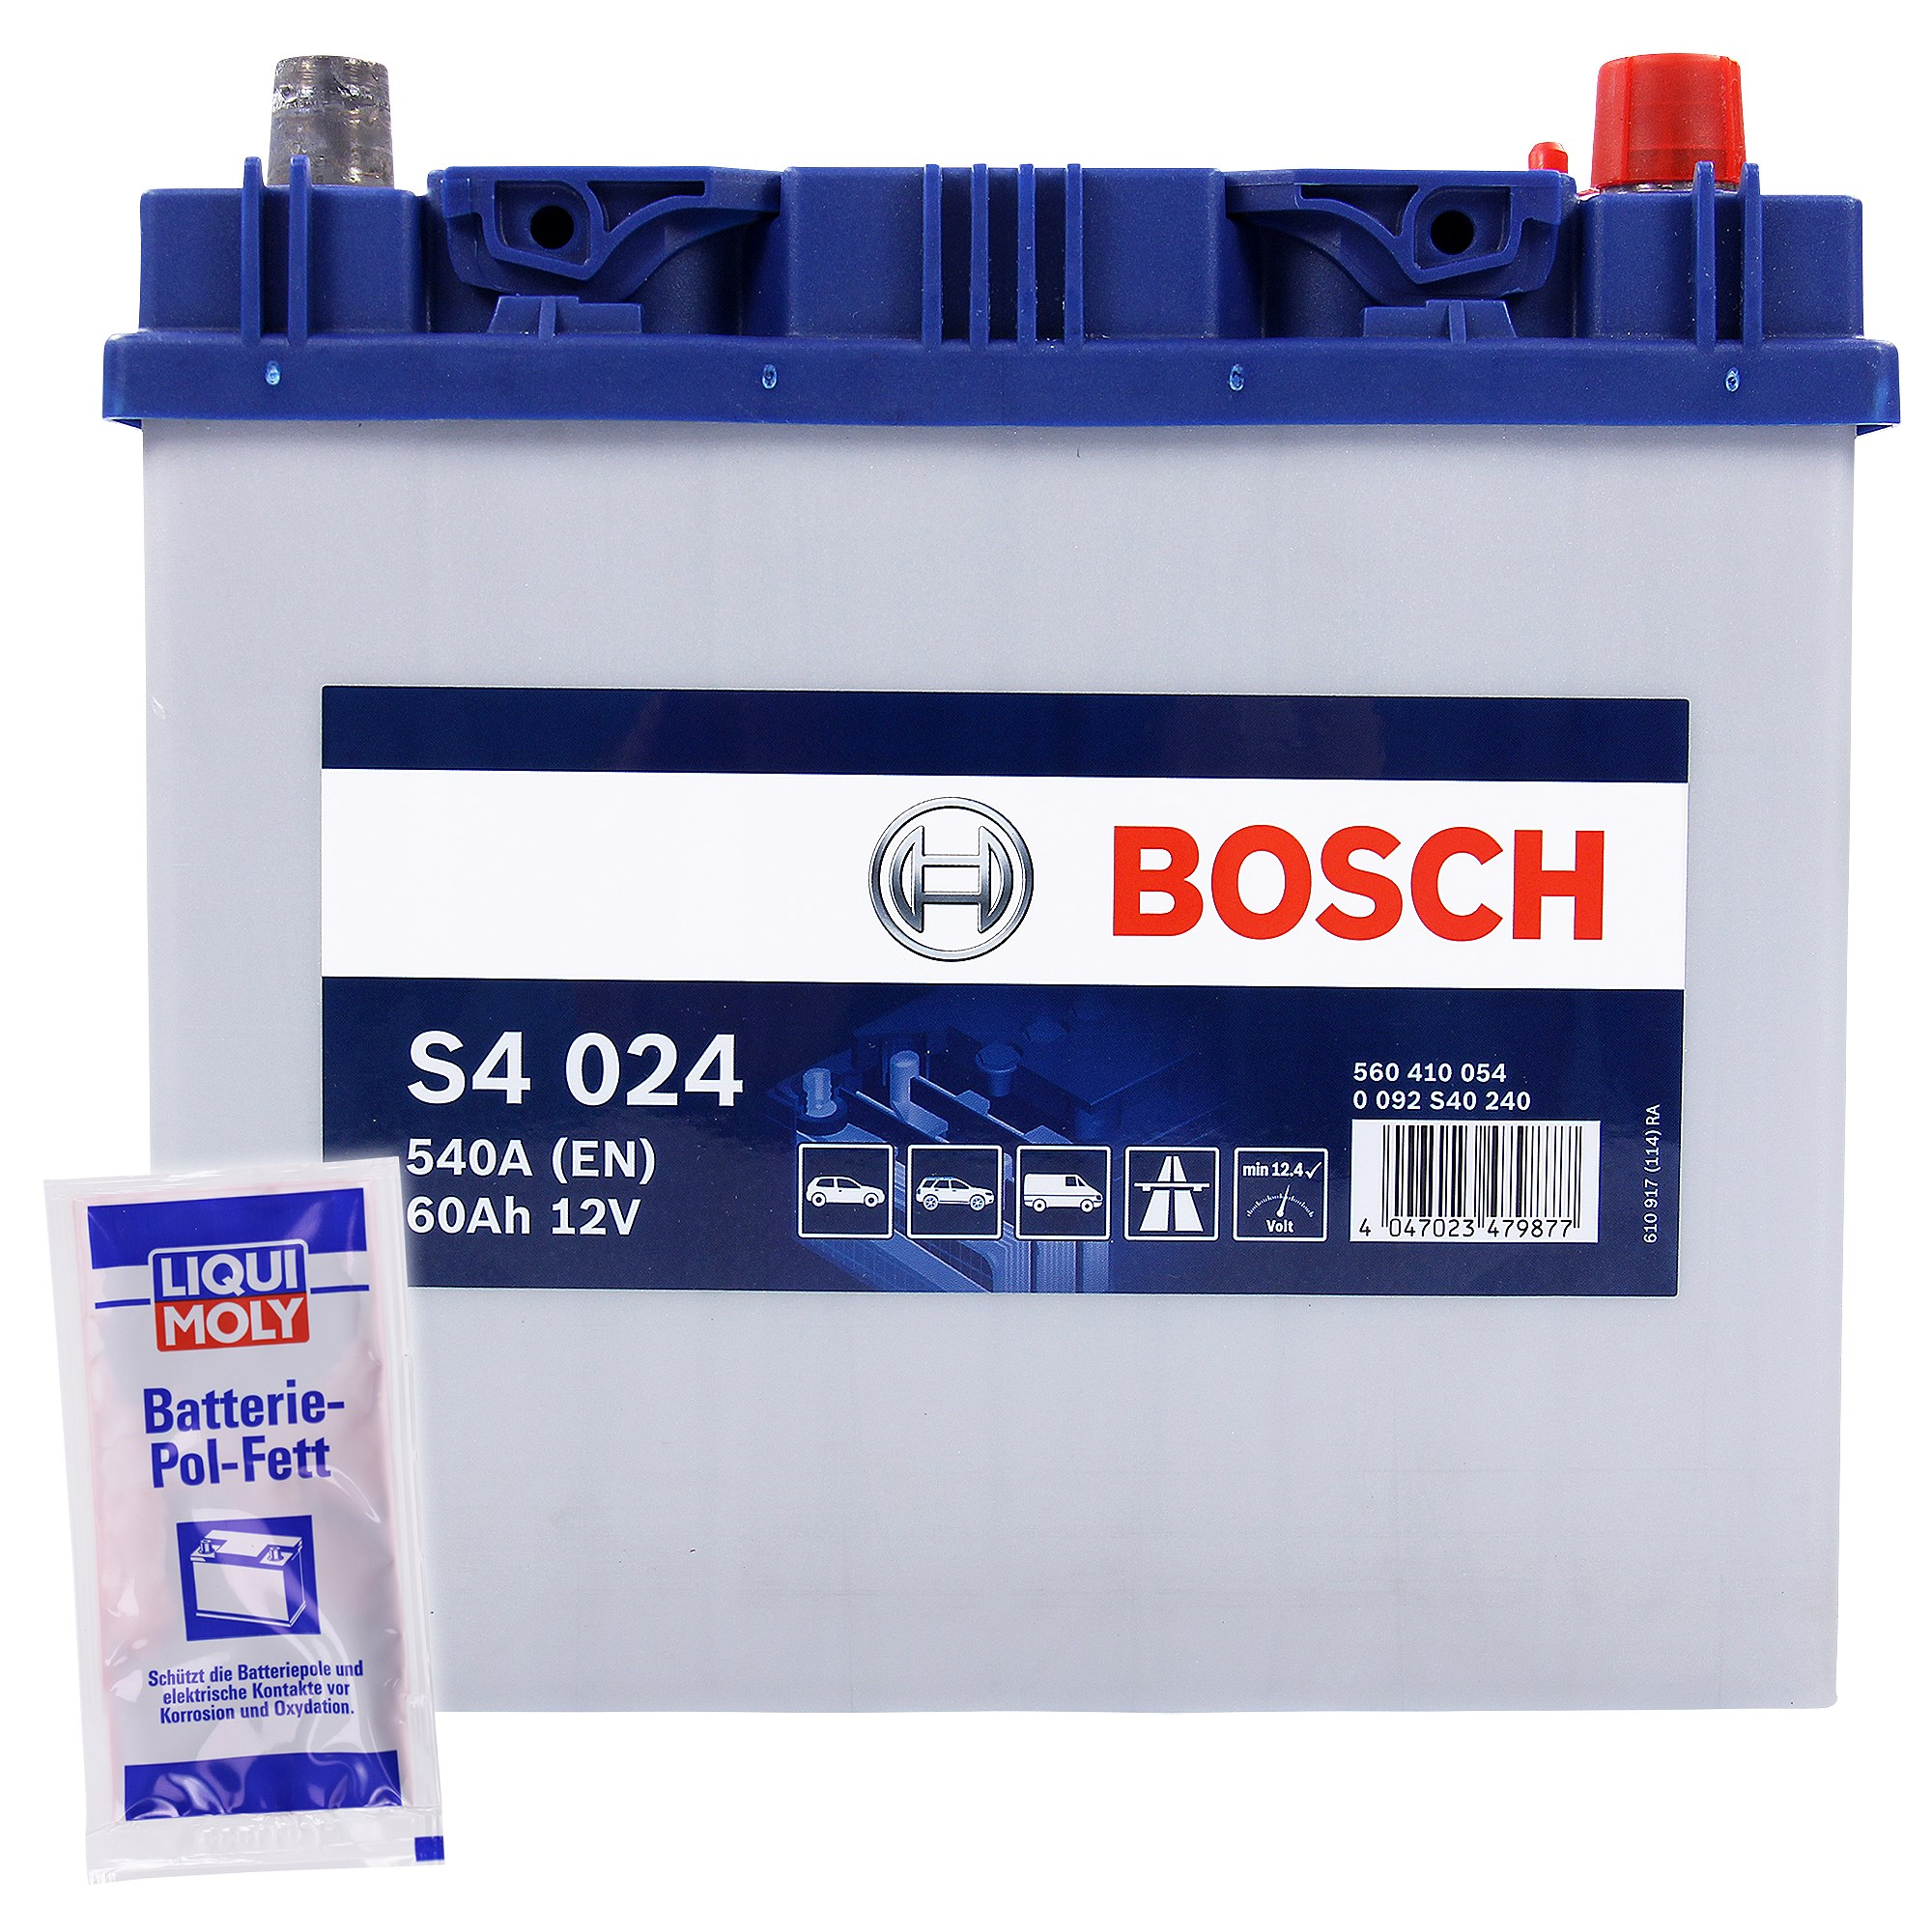 bosch starterbatterie s4 024 60ah 540a 12v 10g pol fett atp autoteile. Black Bedroom Furniture Sets. Home Design Ideas